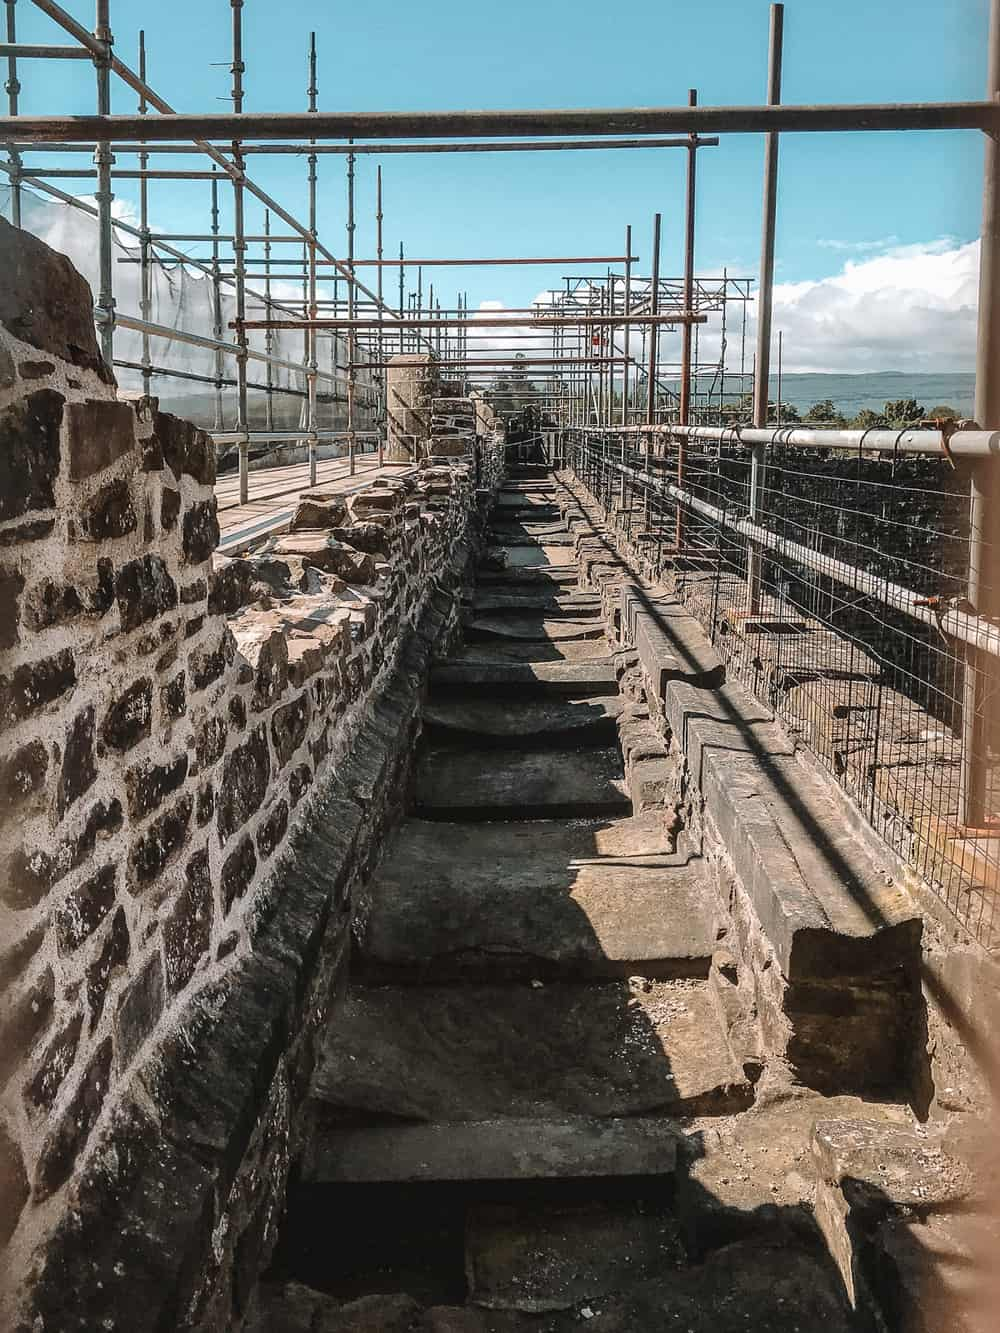 Castle Leoch Walls Doune Castle